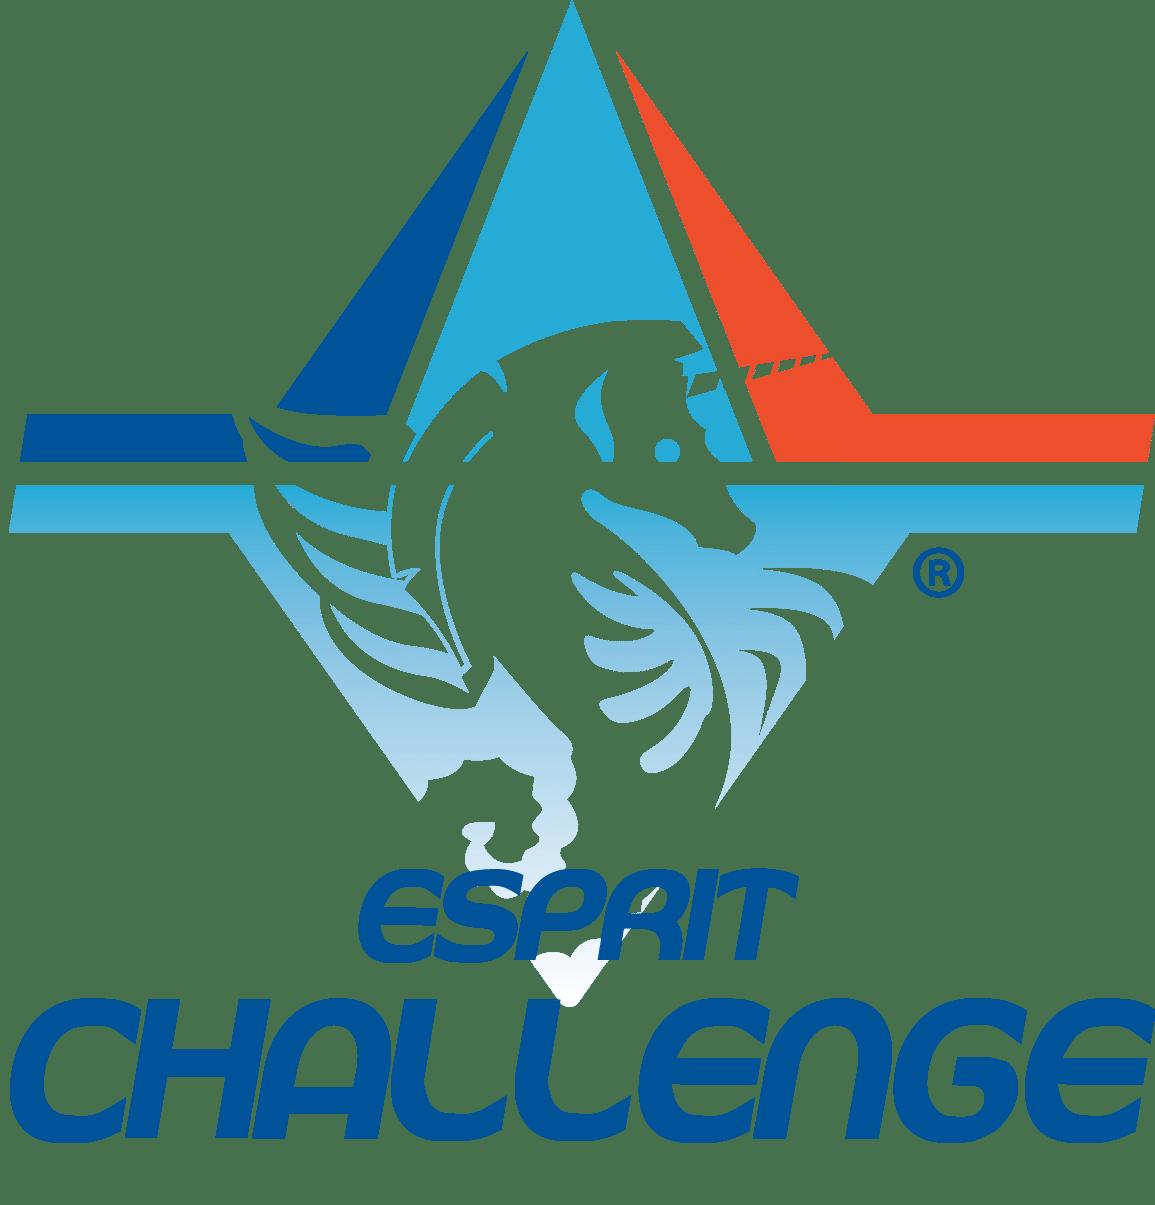 my qualifications esprit challenge com logo esprit challenge 2